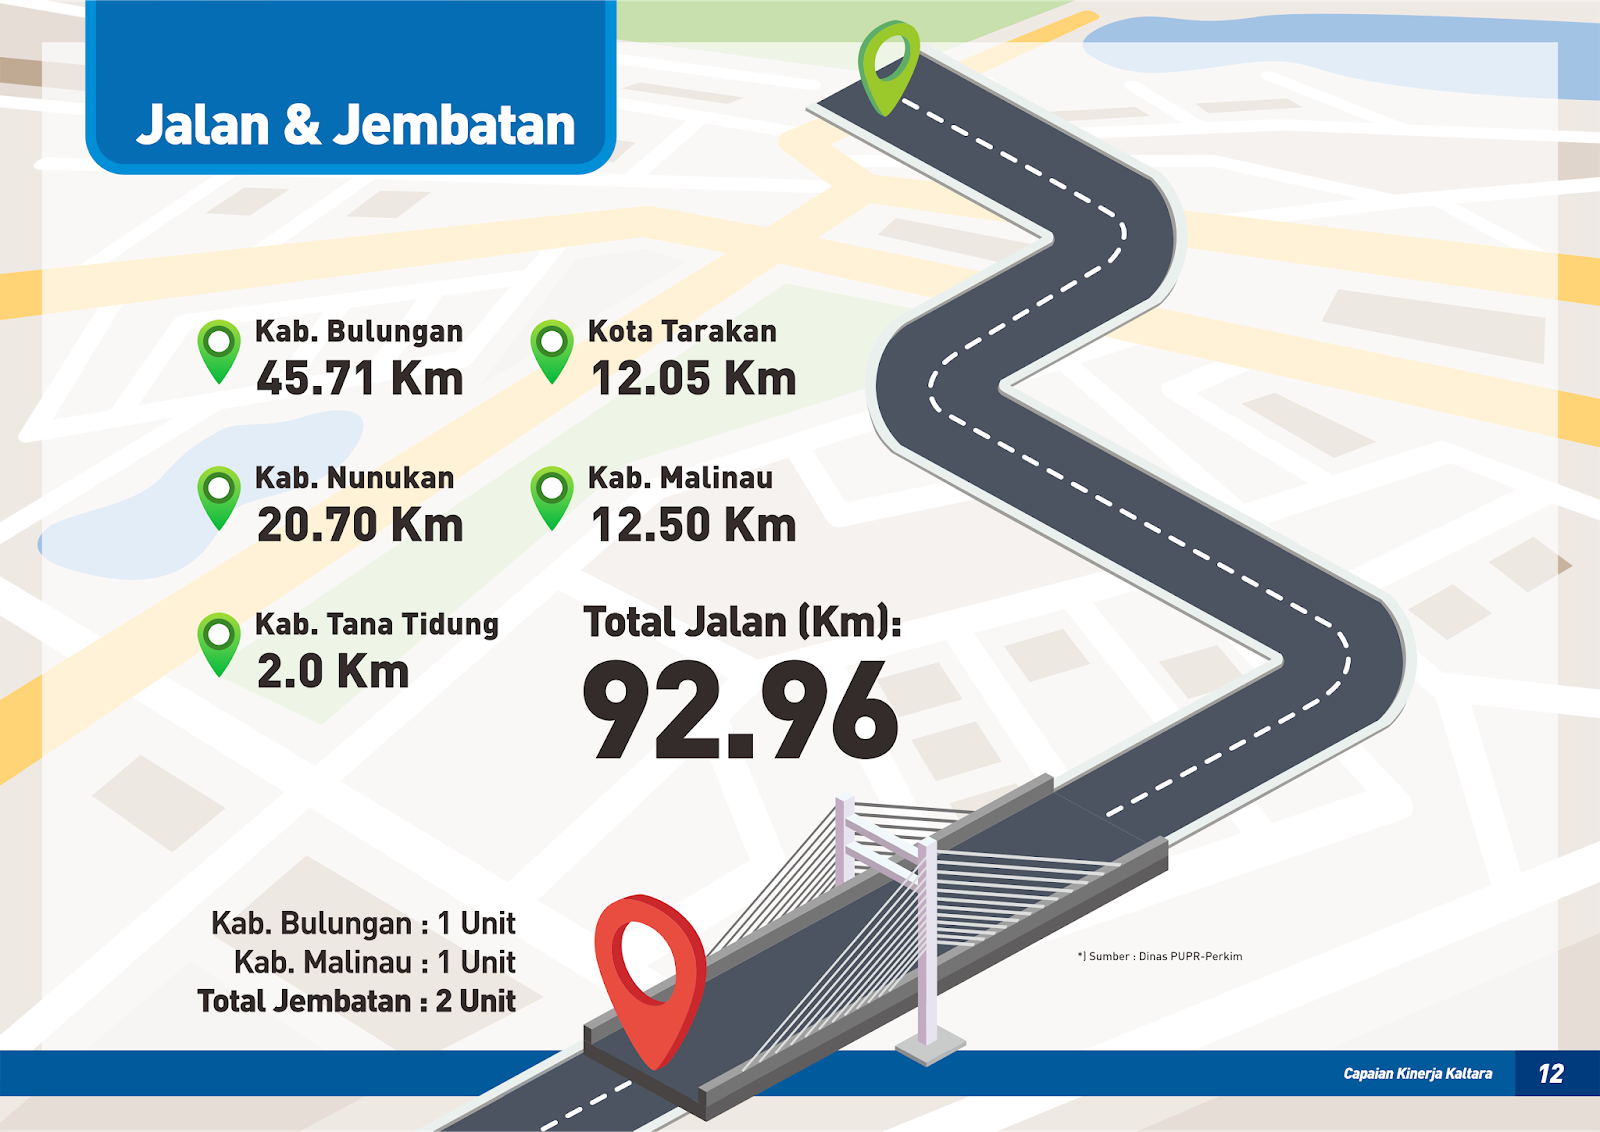 Tahun 2018 Infrastruktur Jalan Terus Digenjot Suara Kaltara